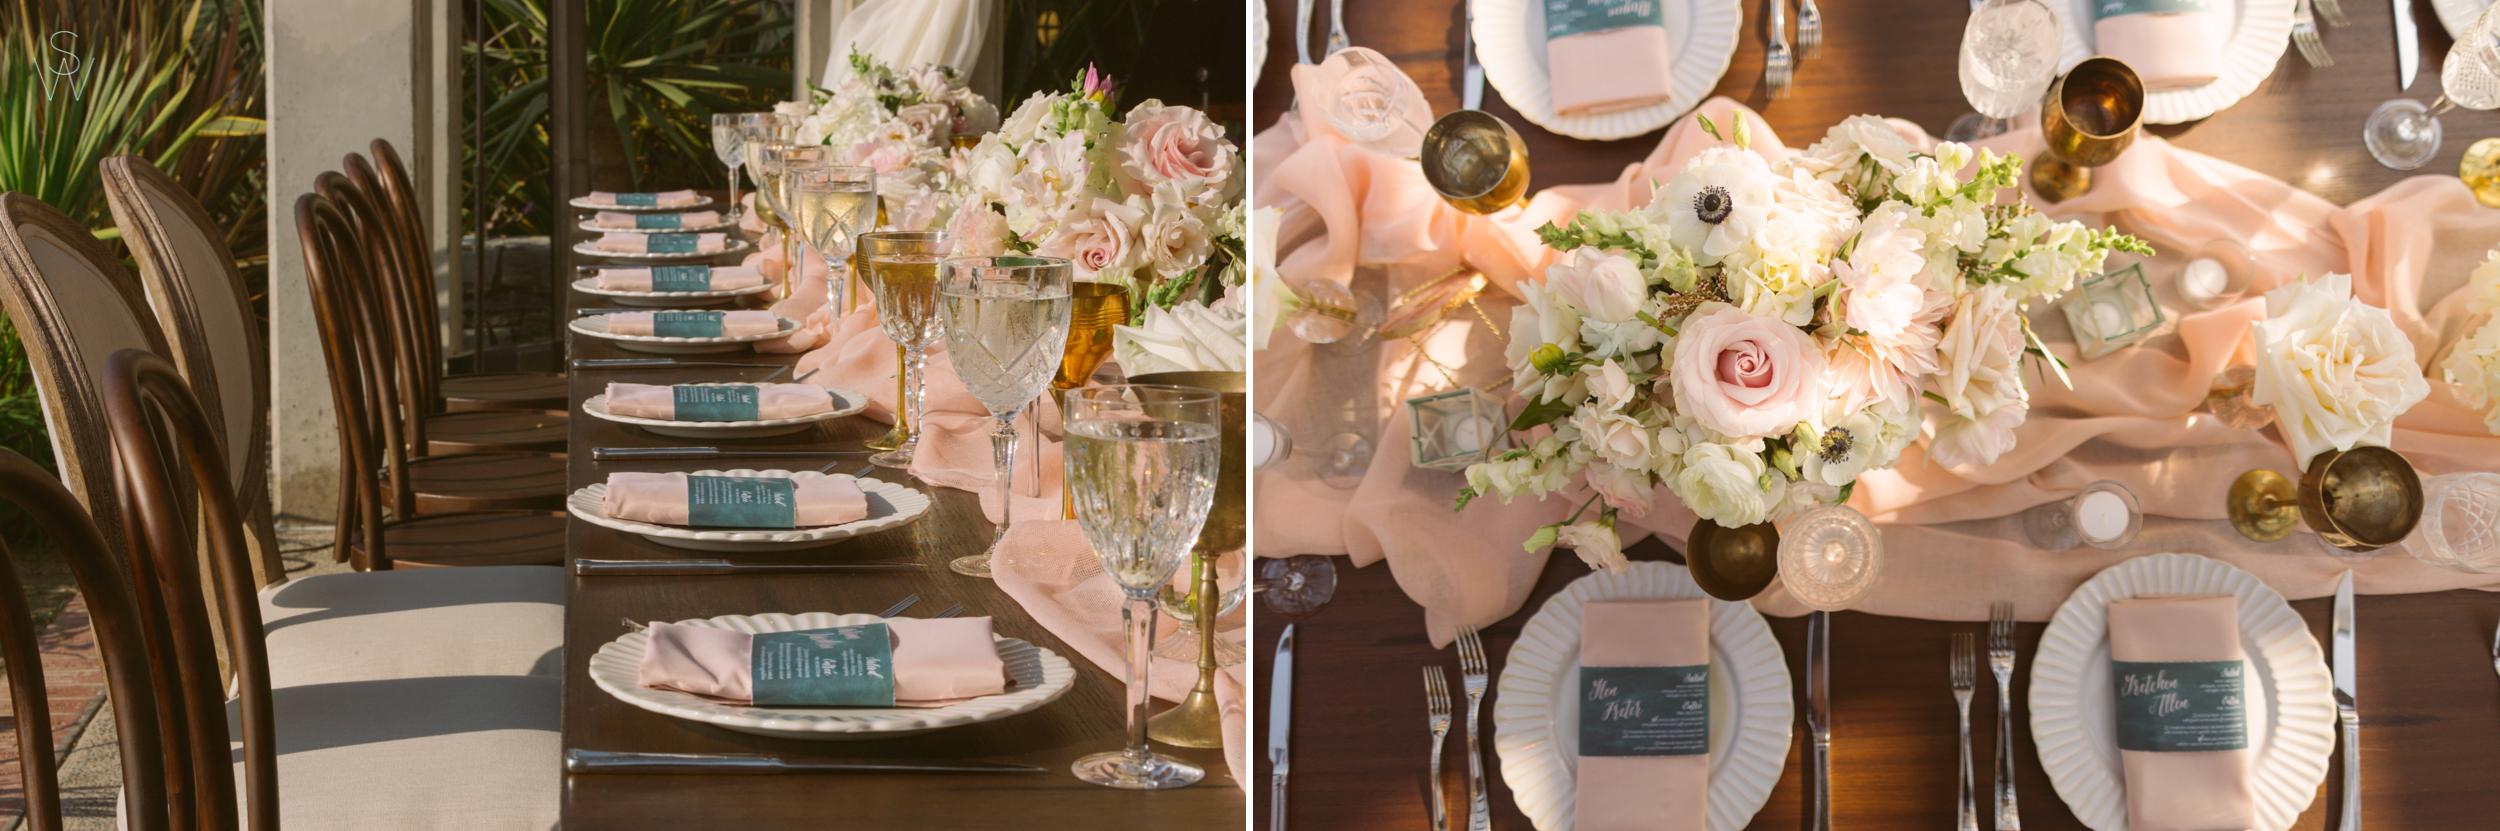 142DEL.MAR.WEDDINGS.luxeevents.photography.shewanders.JPG